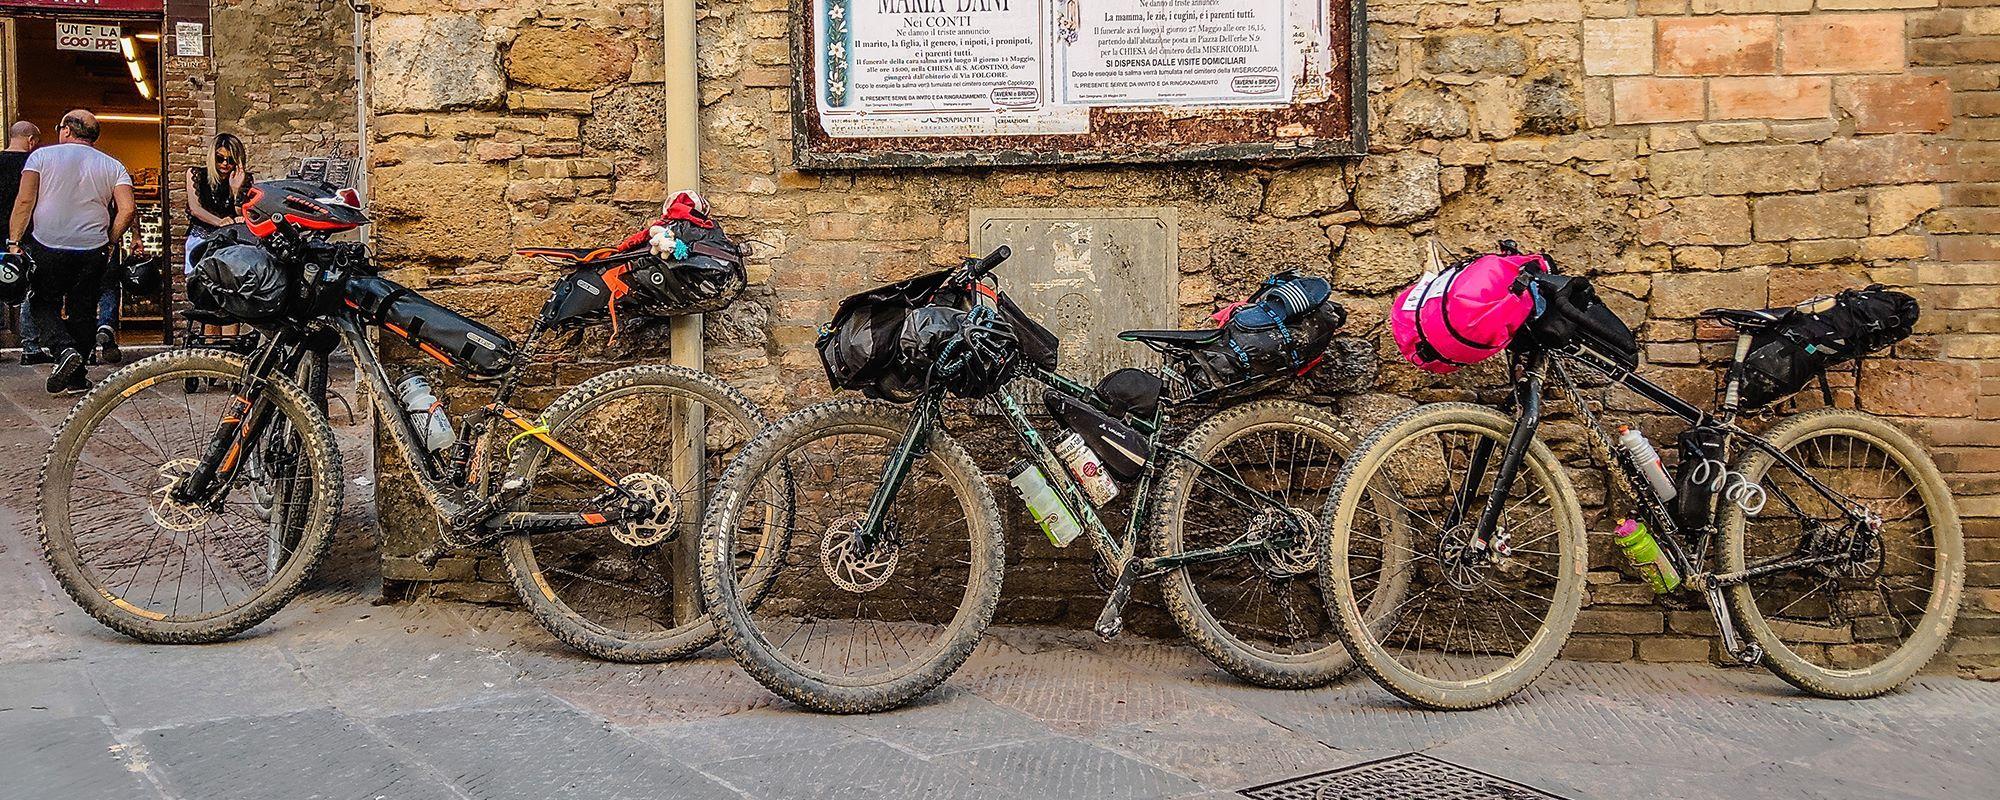 Bikepacking Bags - Review & Comparison (Ultimate Bikepacking Equipment Guide)